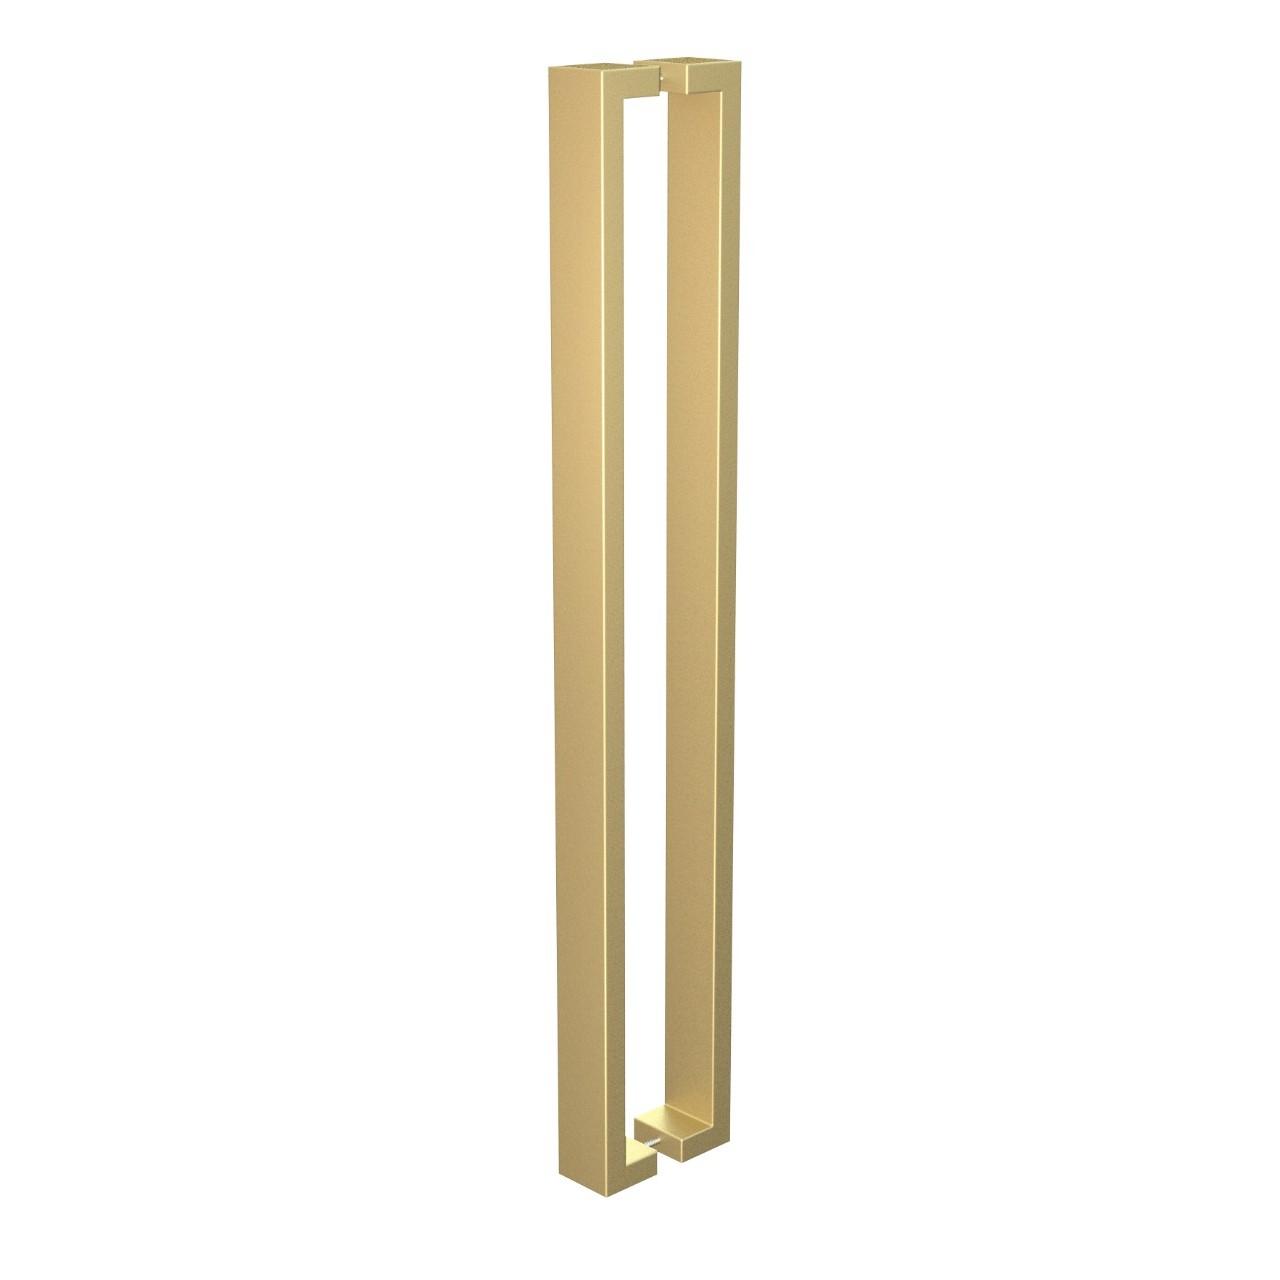 Puxador de Portas Sobrepor Aco Inox 815cm 1 par Leblon Gold - Acobrasil